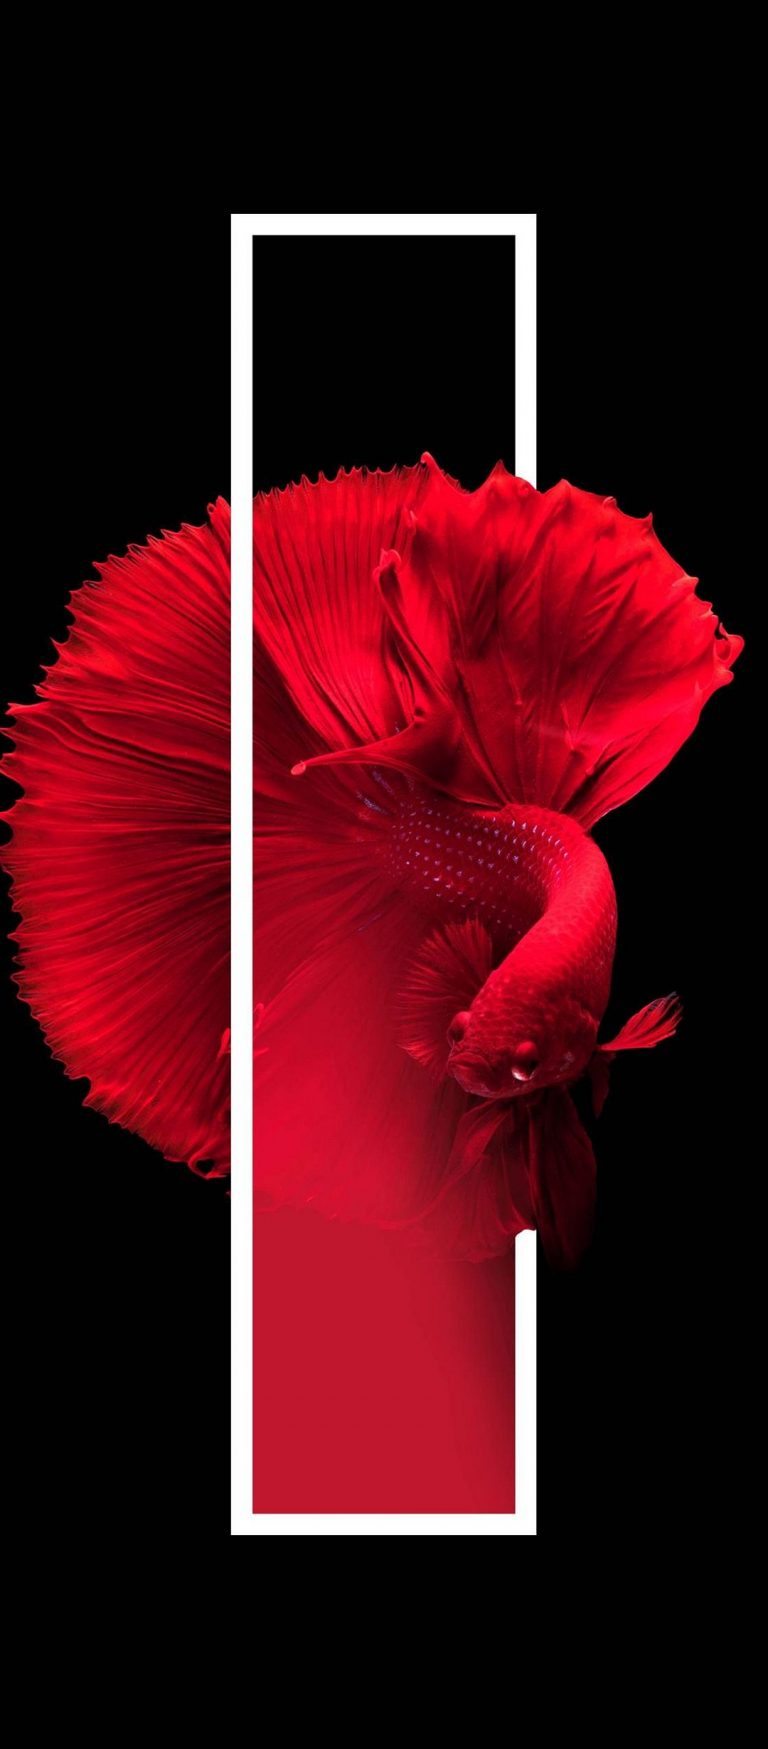 Red Fish Black Background Minimal 1080x2460 768x1749